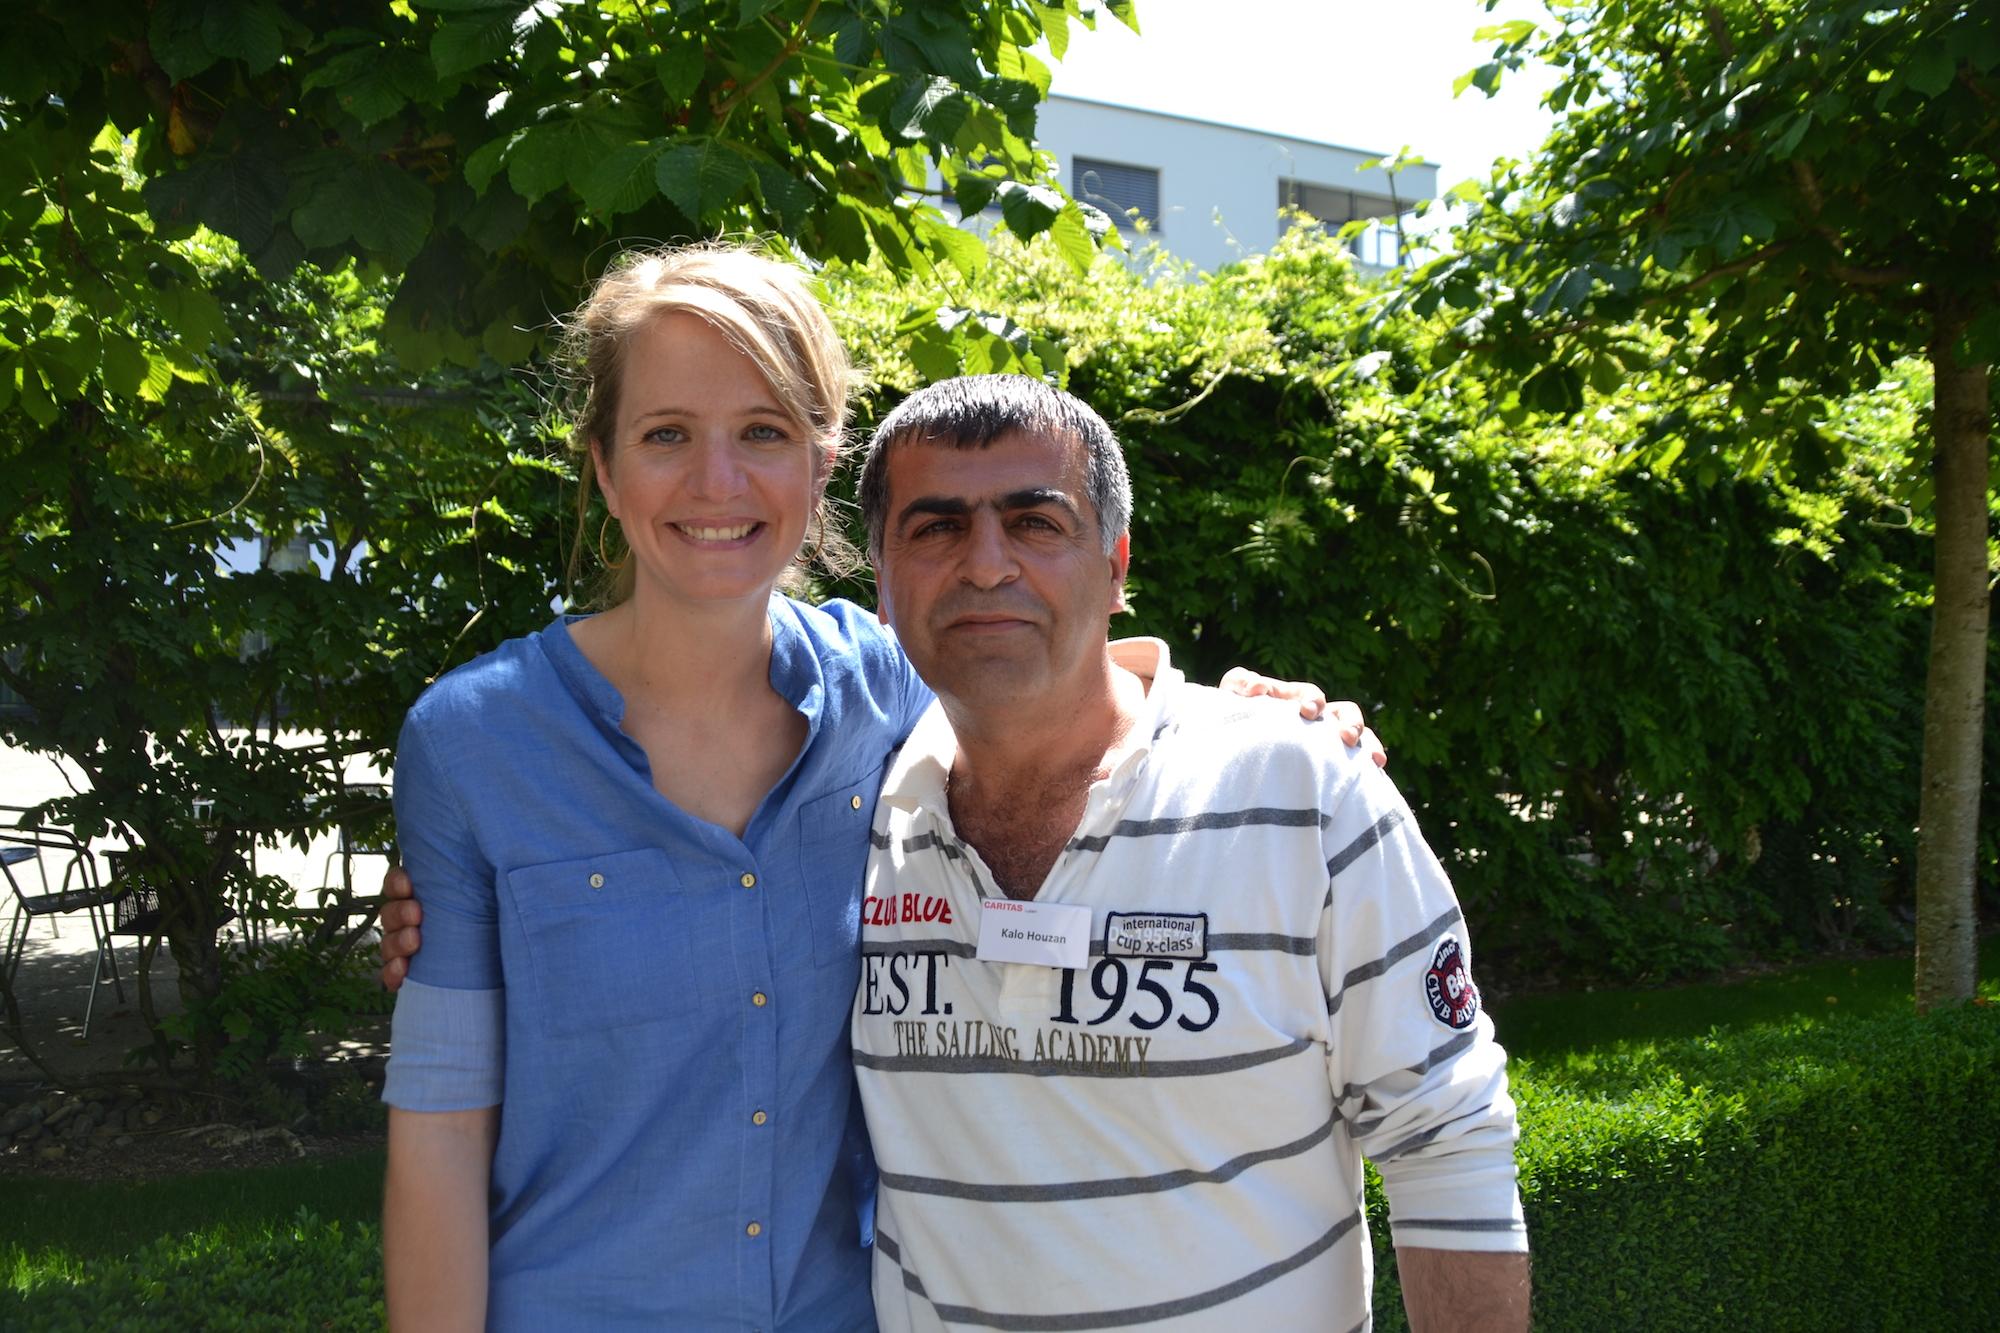 Zentrumsleiterin Martina Gerber mit Bewohner Kalo Houzan